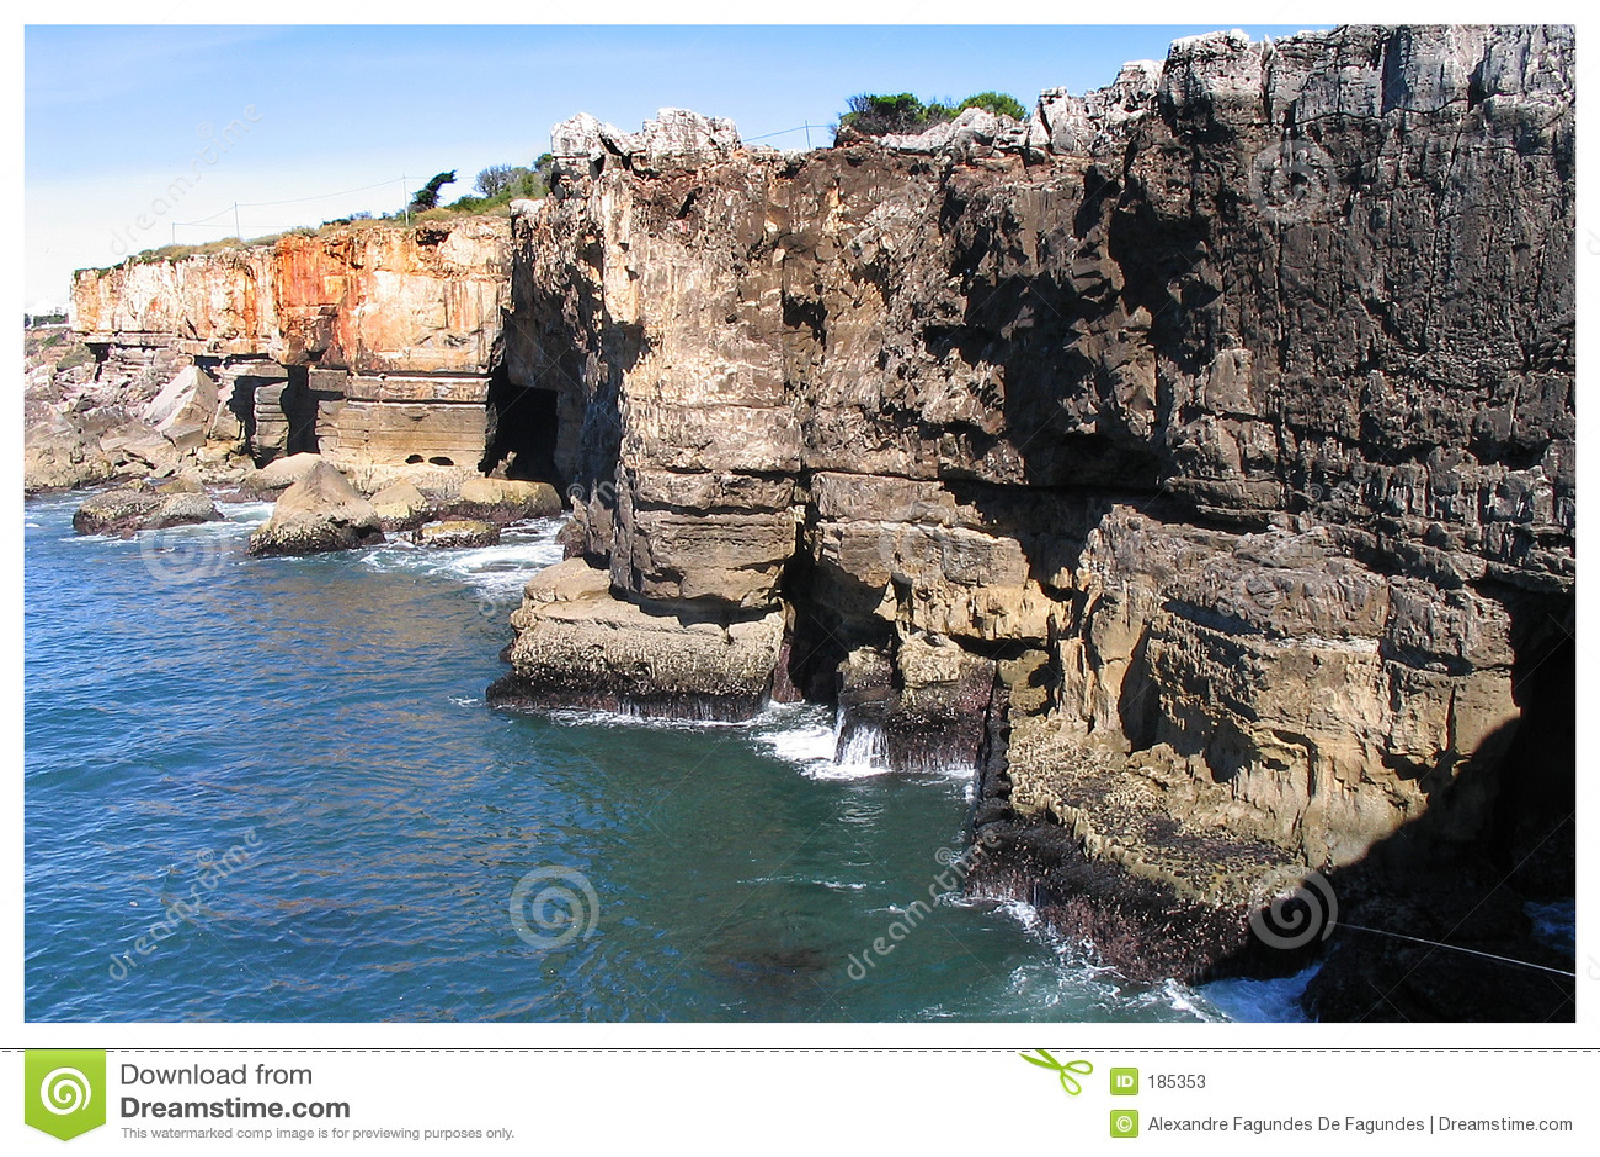 Boca hace el infierno - Cais Cais - Portugal